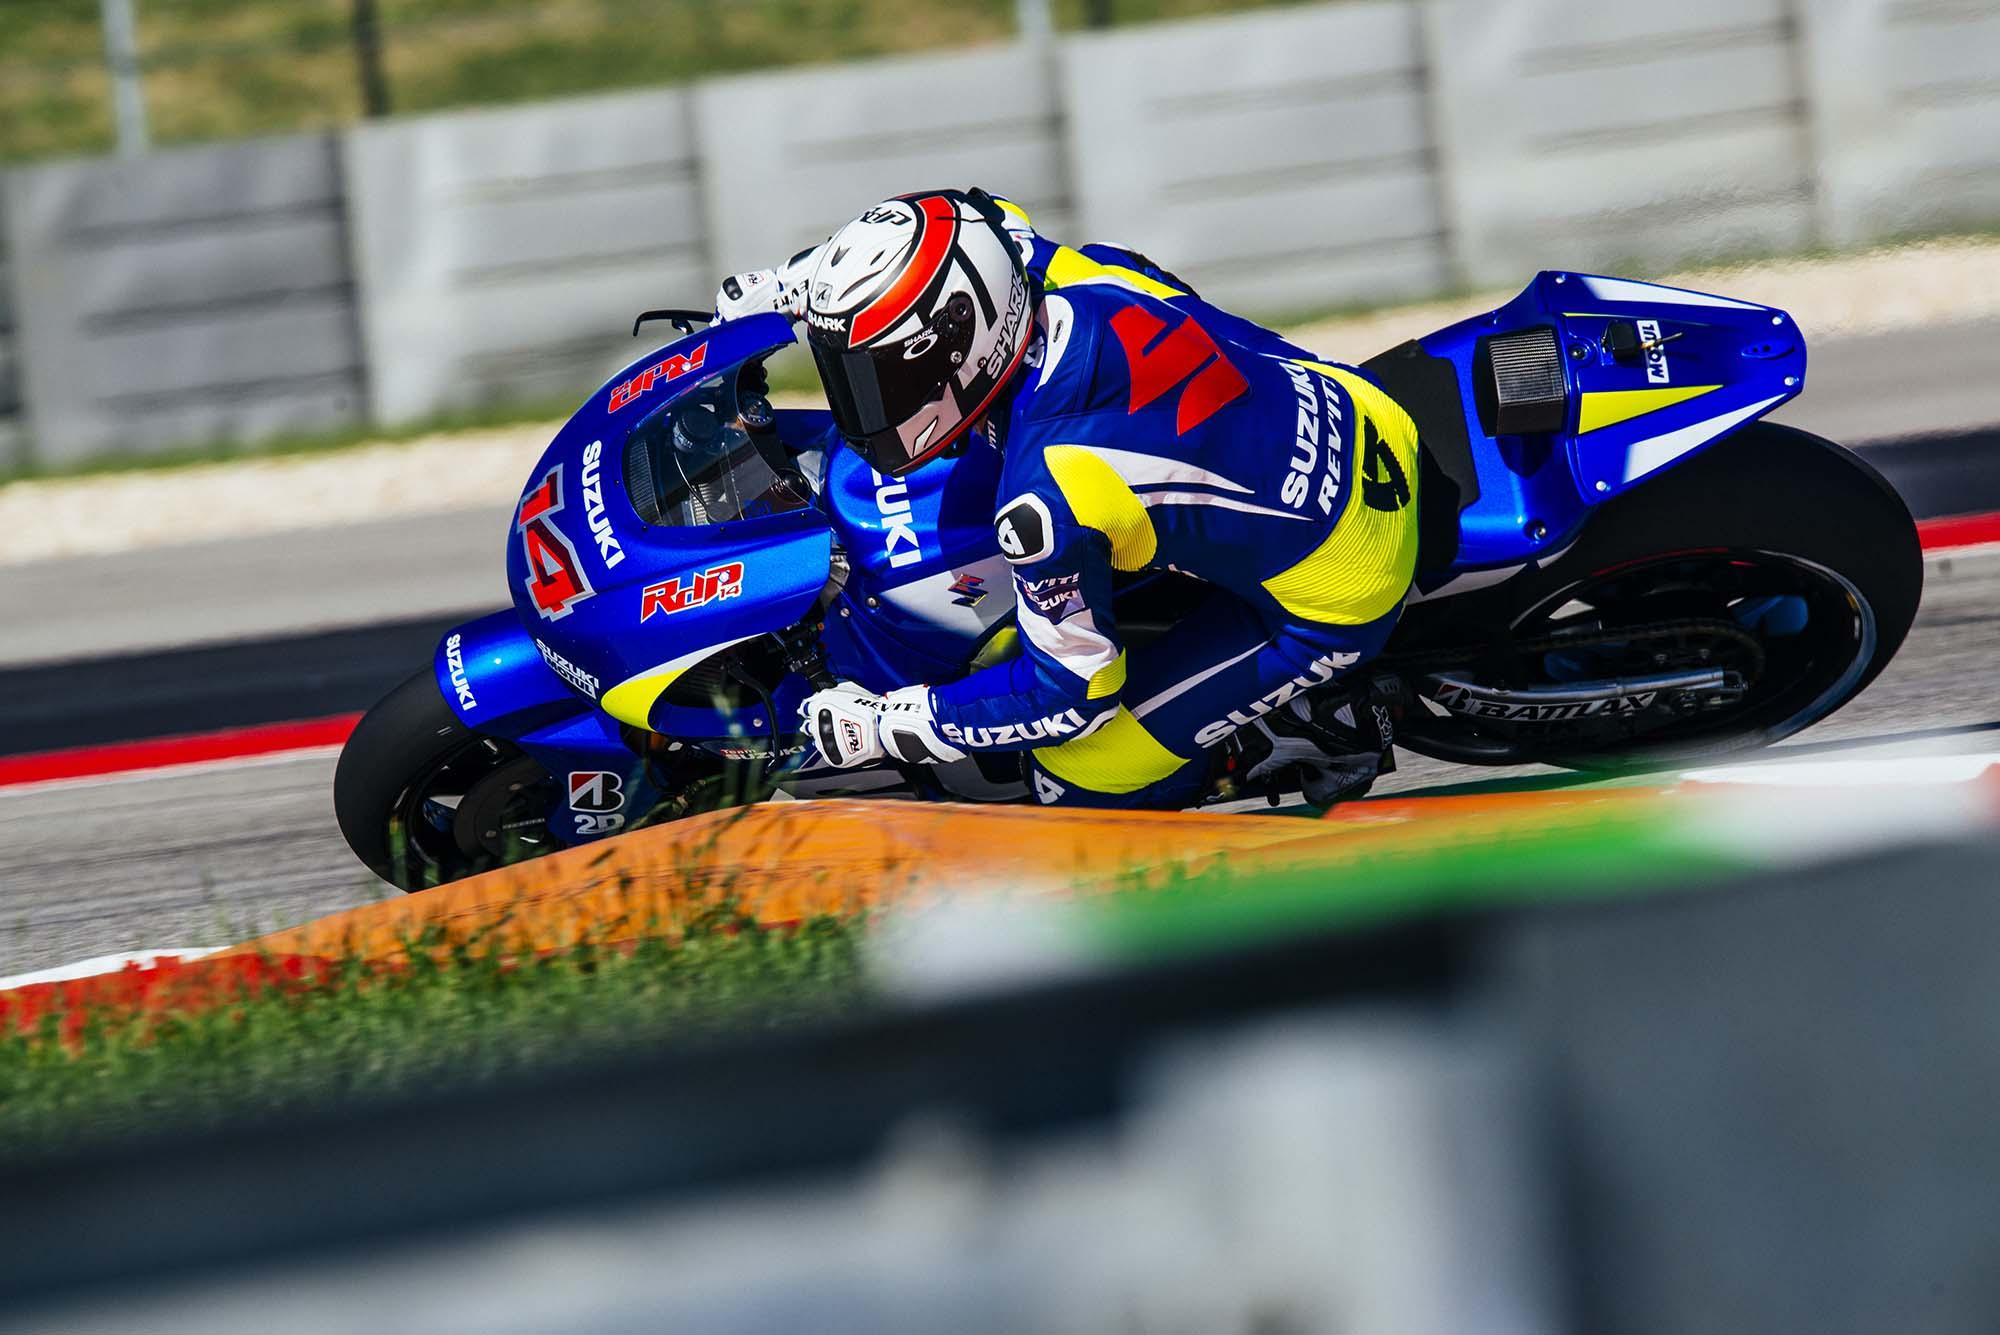 Kevin Schwantz Tests Suzuki XRH-1 MotoGP Bike at COTA, While Randy De Puniet Matches Pace of ...